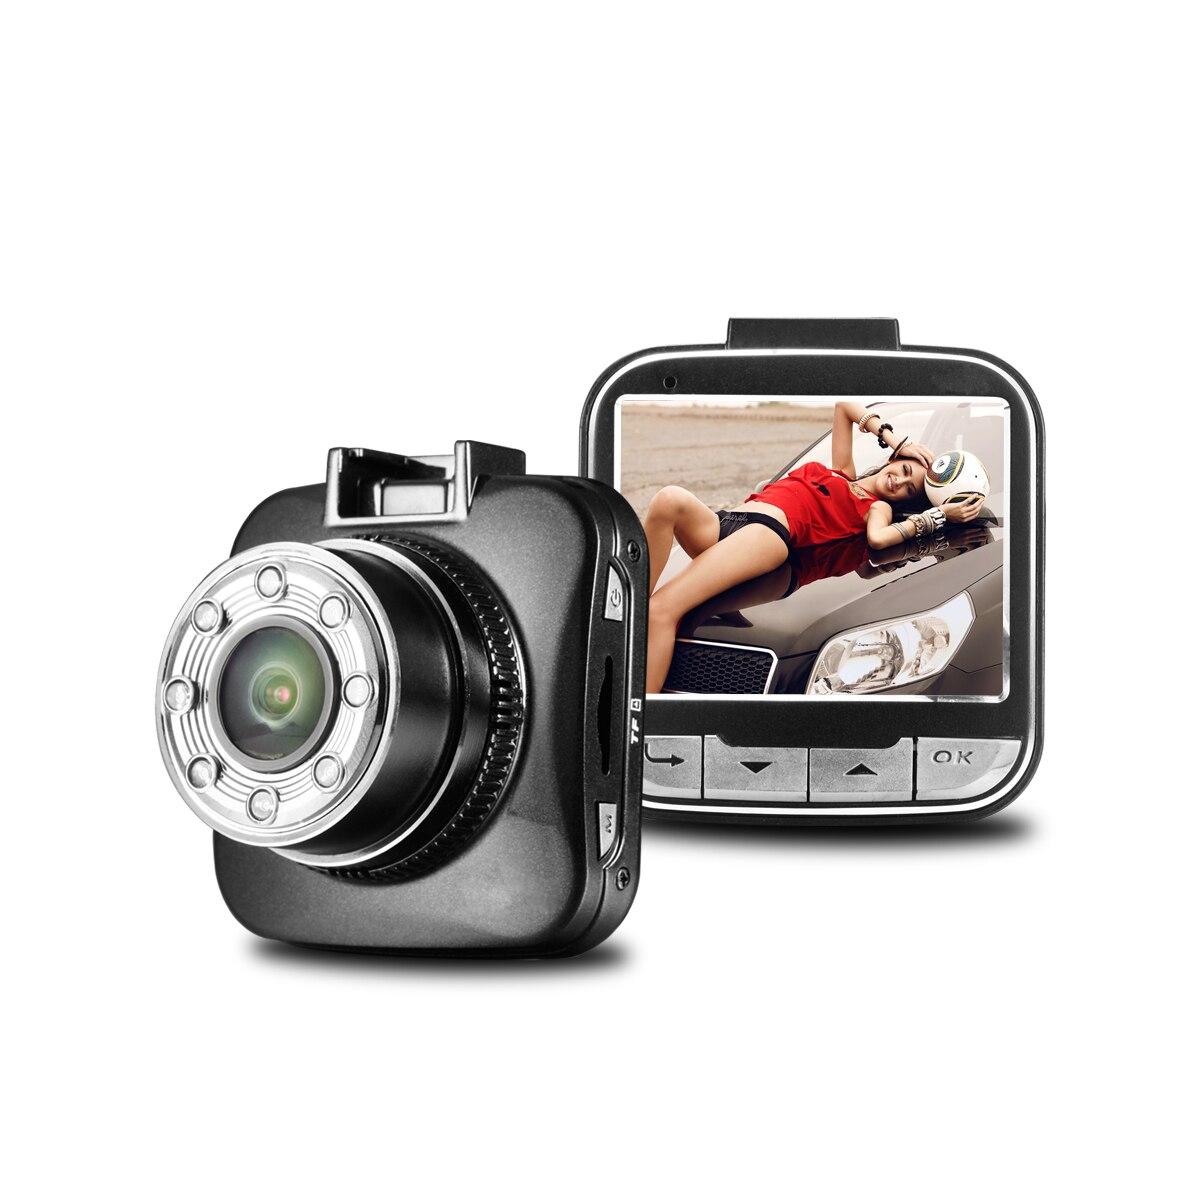 Mini Car DVR Novatek 96650 G55 Full HD 1080P Video Registrator Recorder 2.0LCD Dash Cam Night Vision G-Sensor Car Camera 8268 1080p full hd car dvr lcd hdmi camera video recorder dash cam g sensor